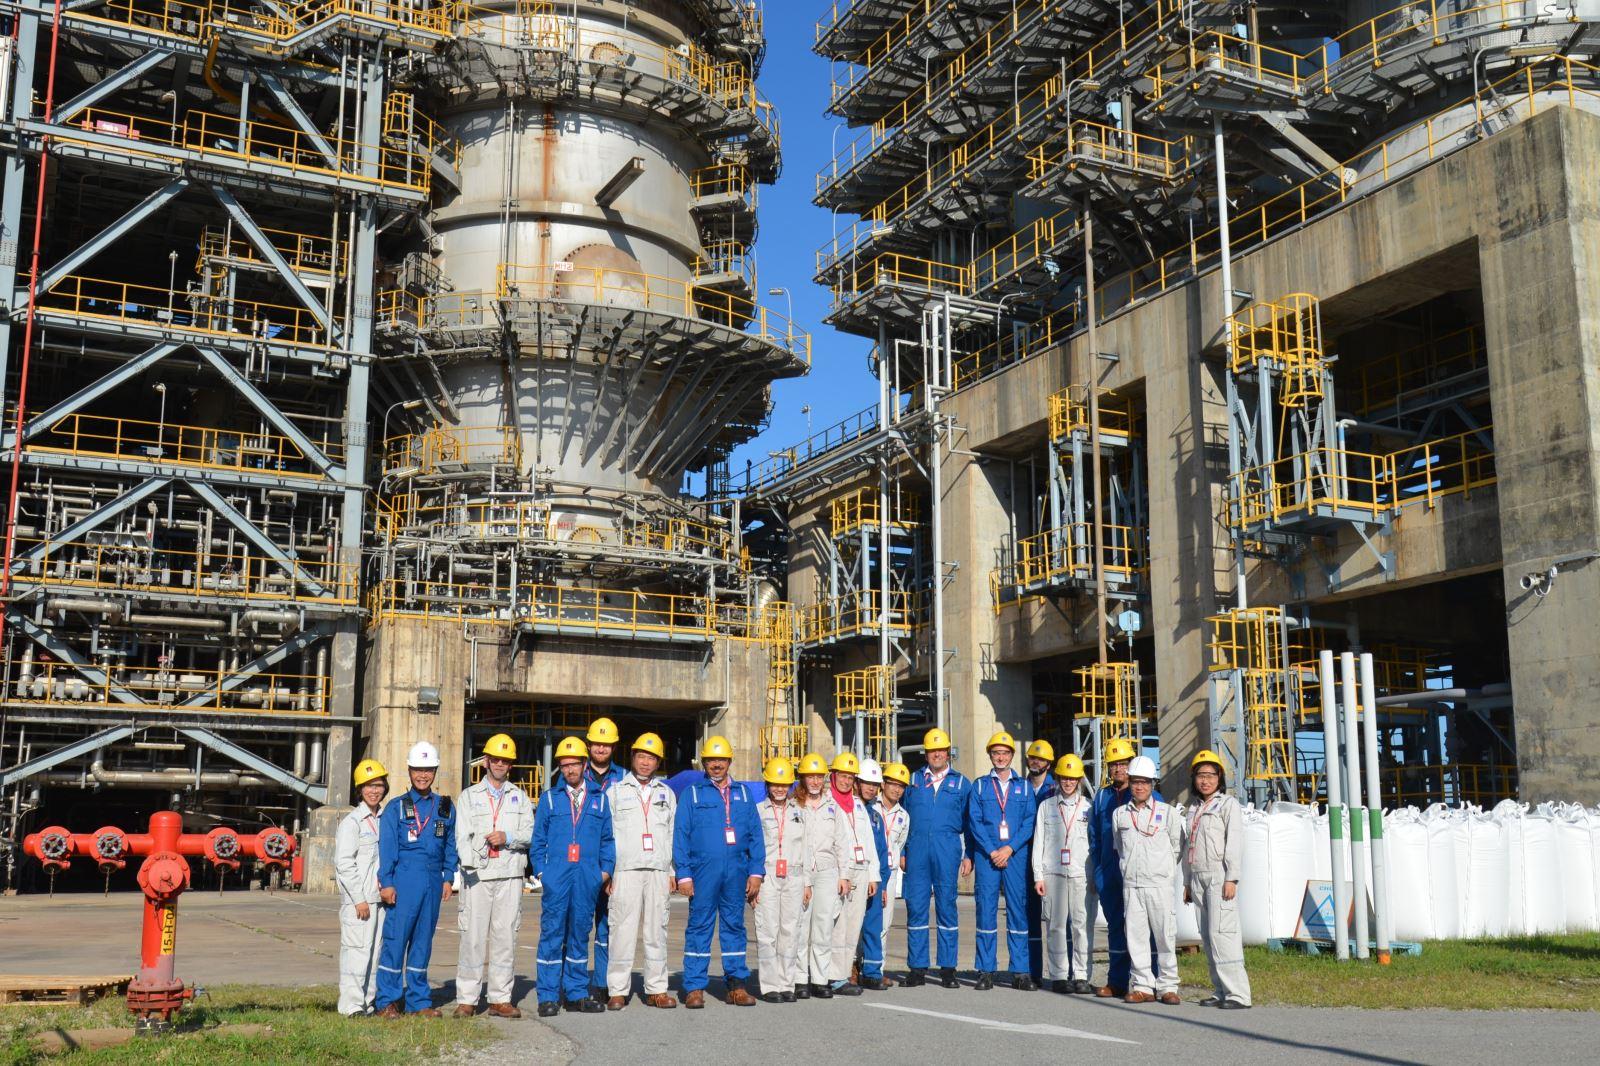 Delegation of technological experts works with BSR